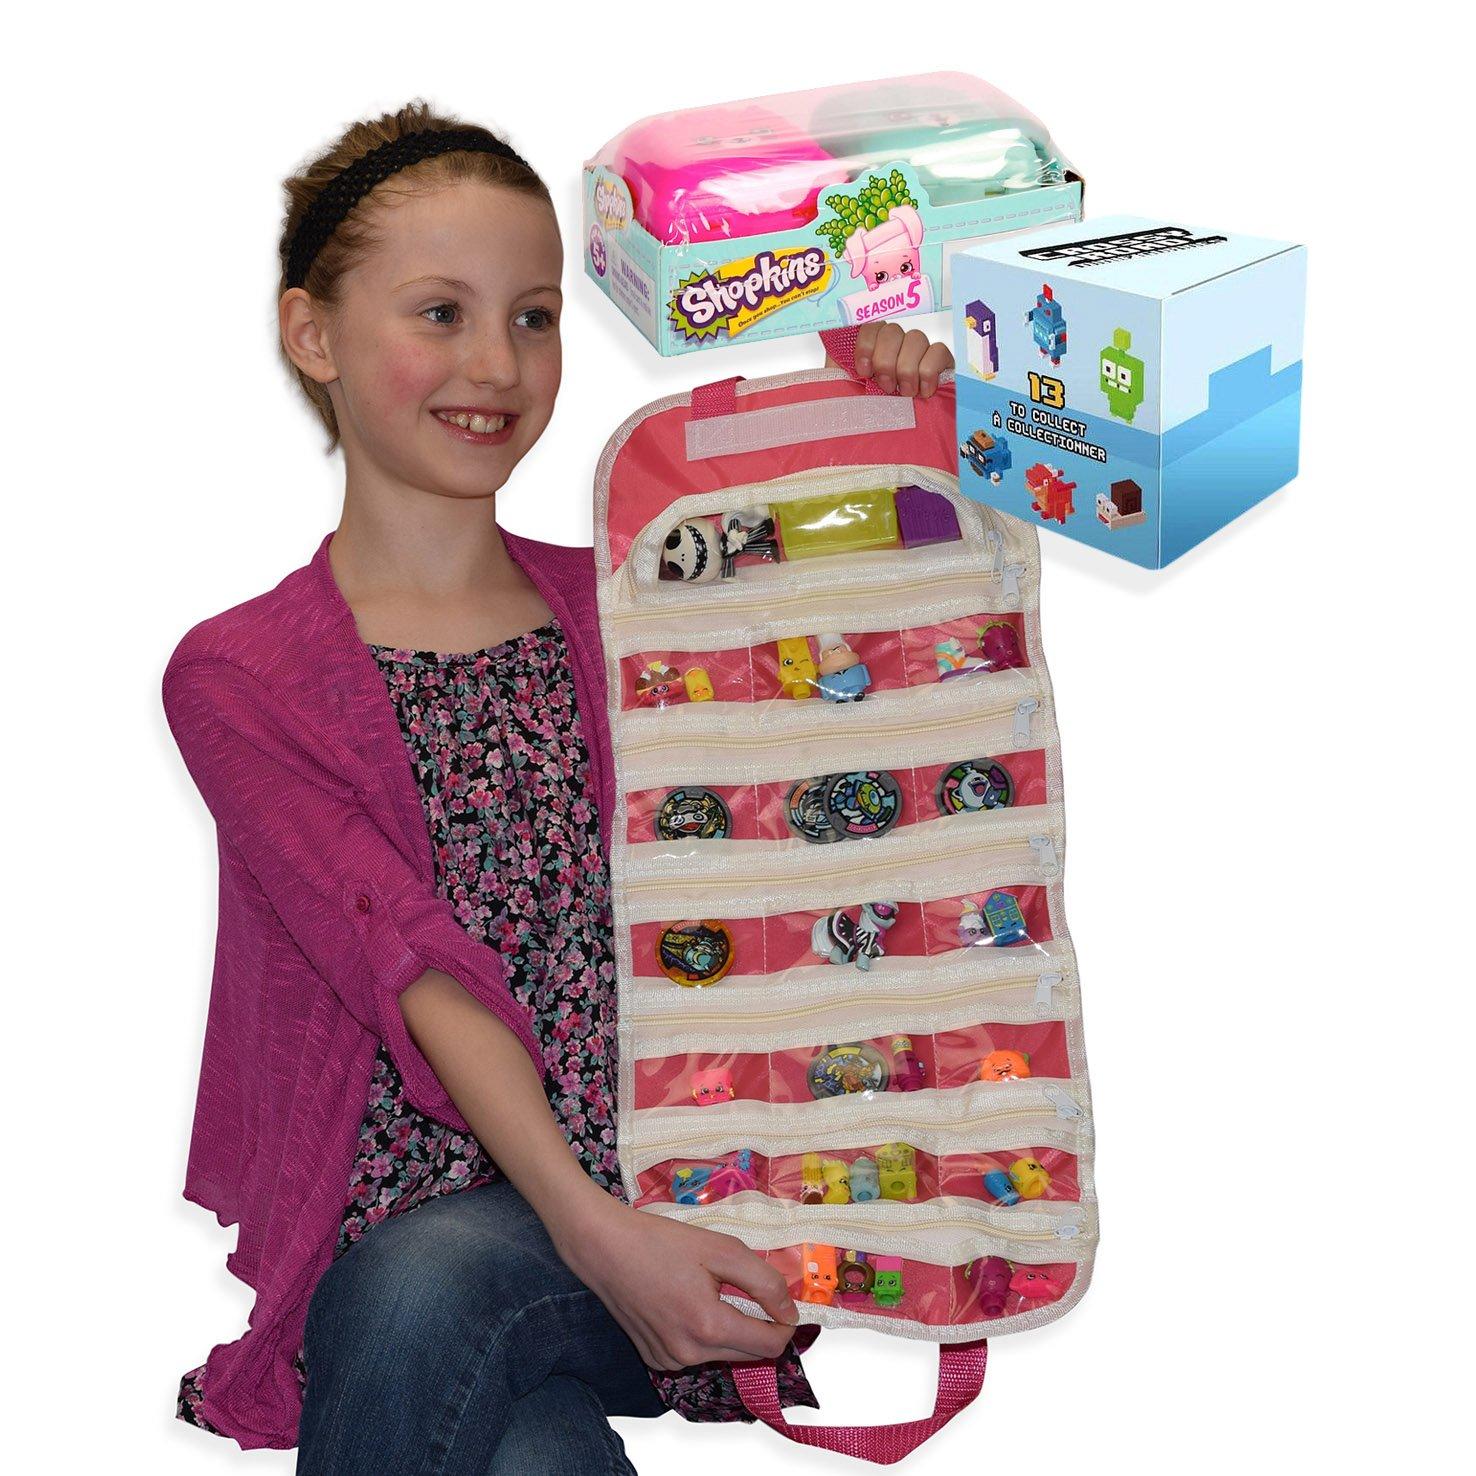 Amazon Crossy Road Shopkins Compatible Toy Organizer Bundle Pink Toys Games